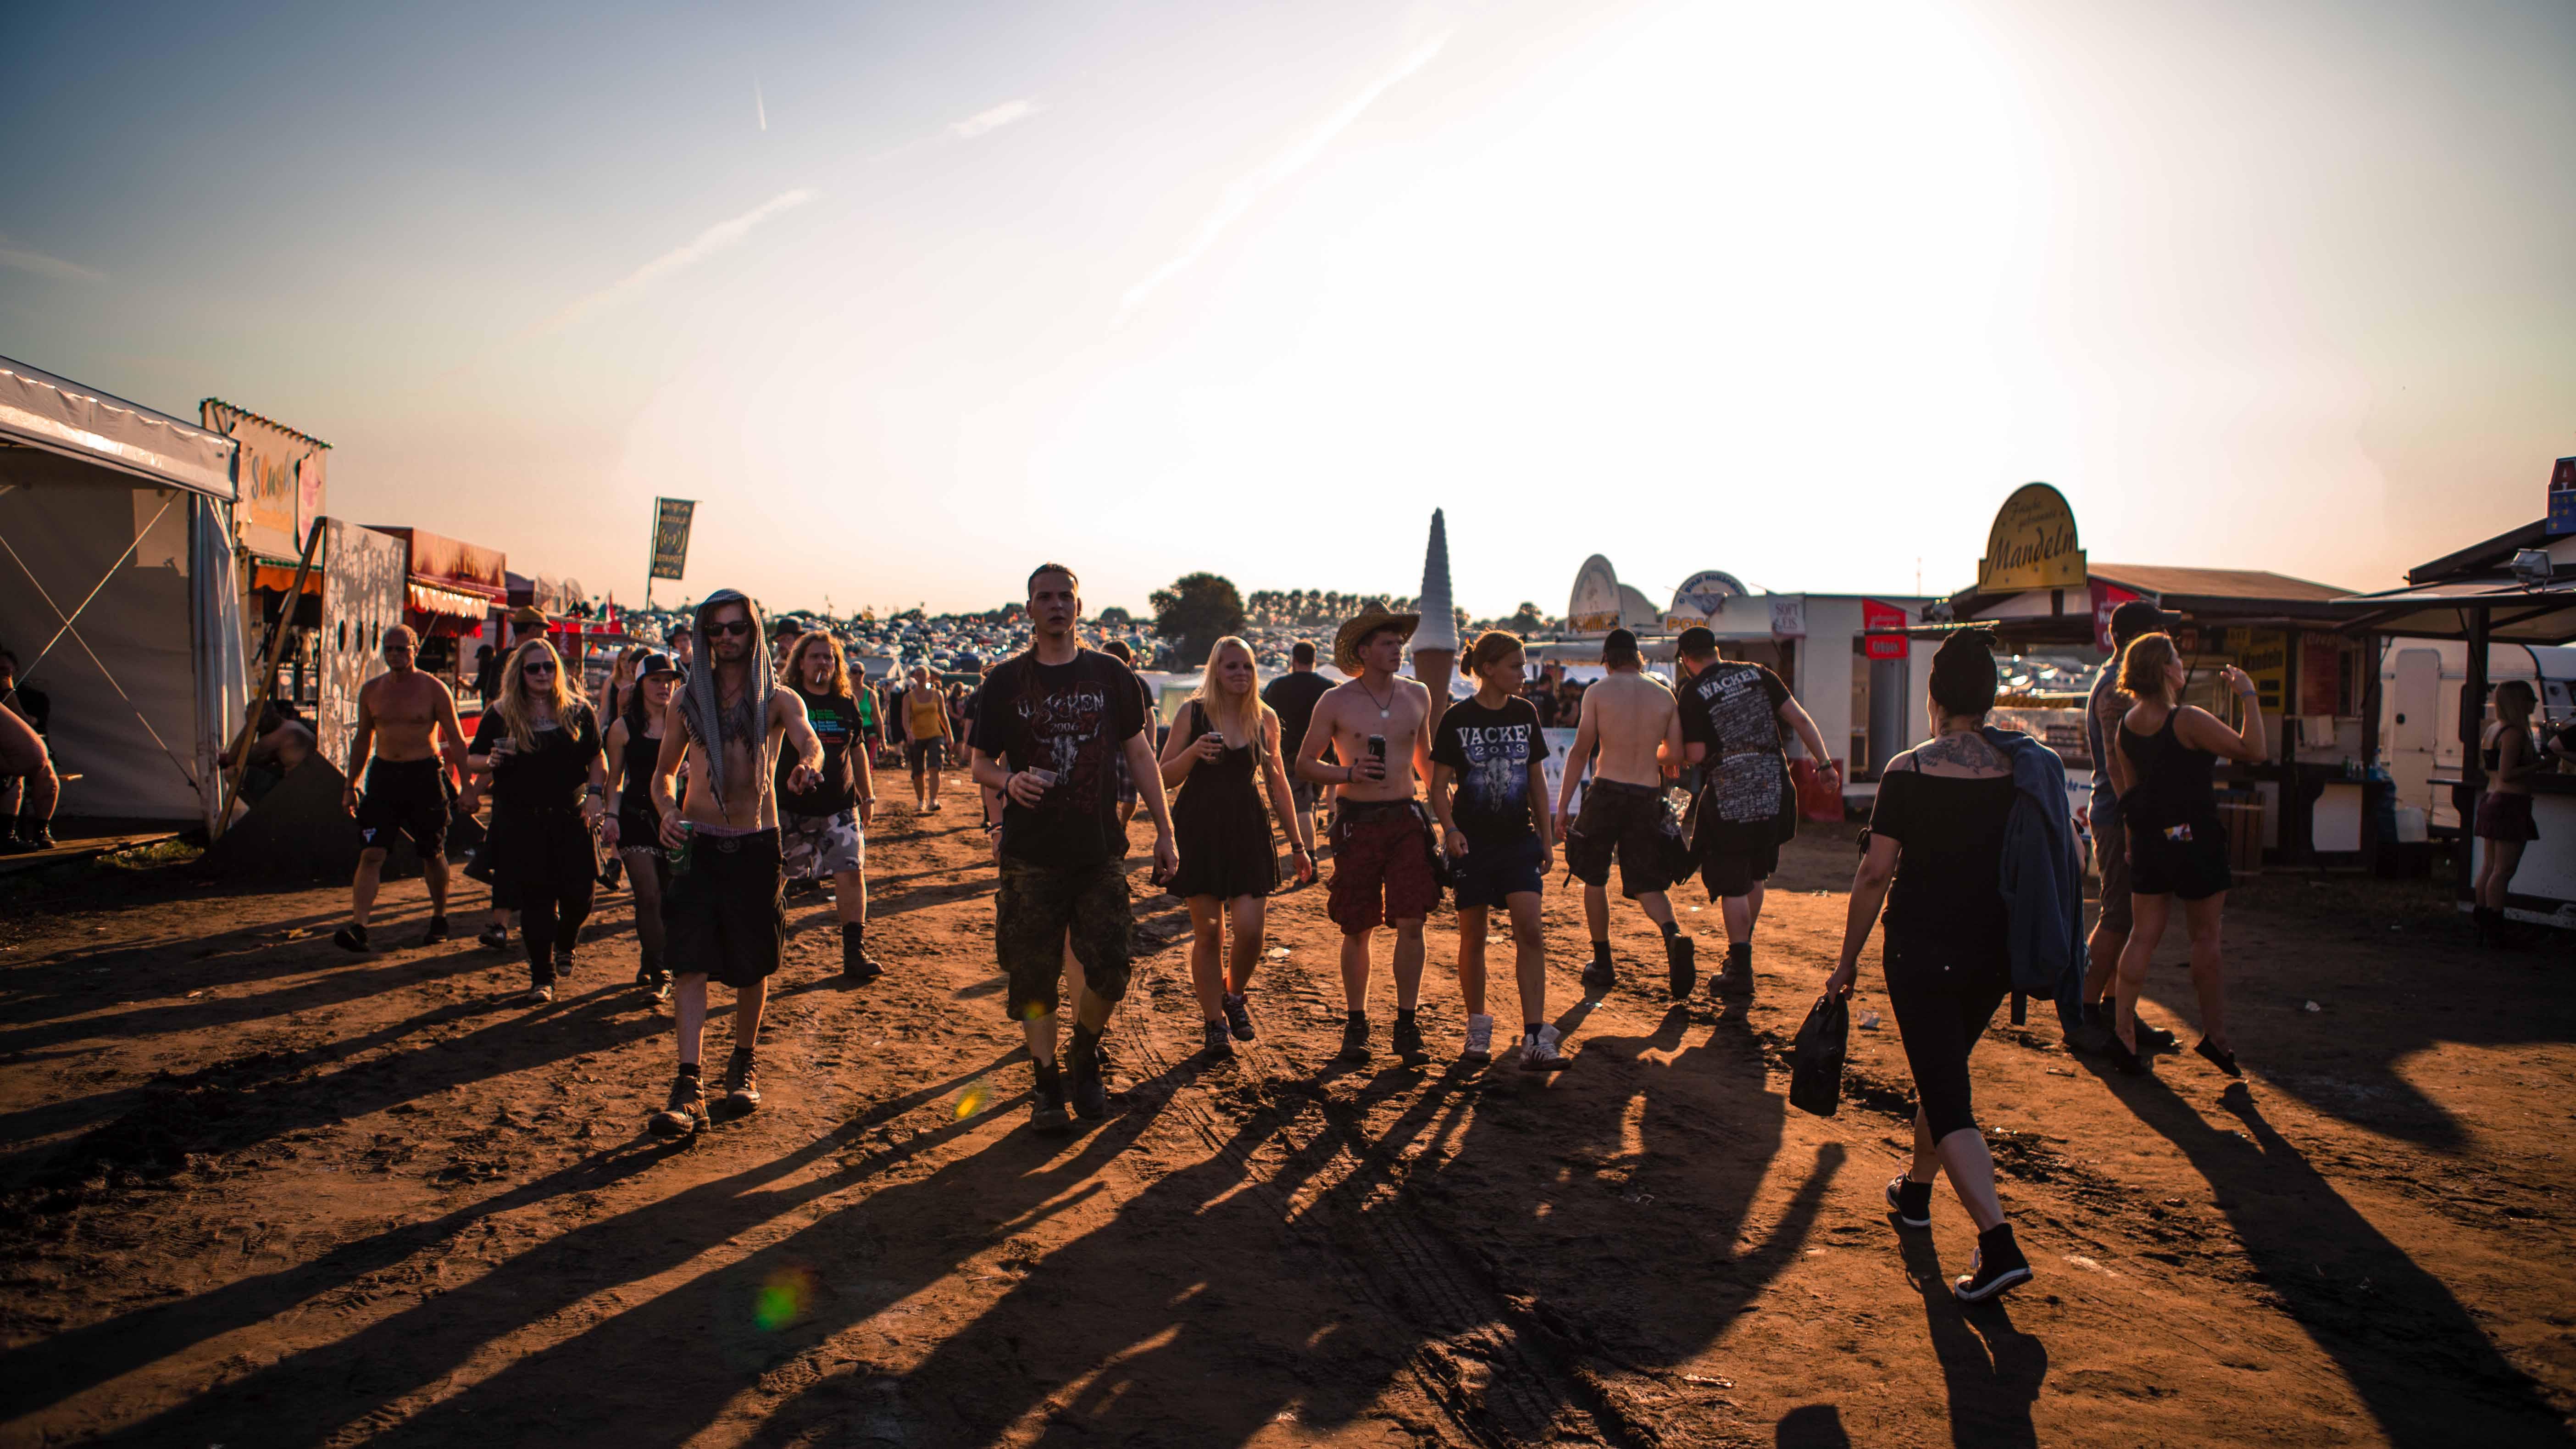 Ach, Festivals sind wundervoll! – Das Amt Schenefeld auf dem W:O:A